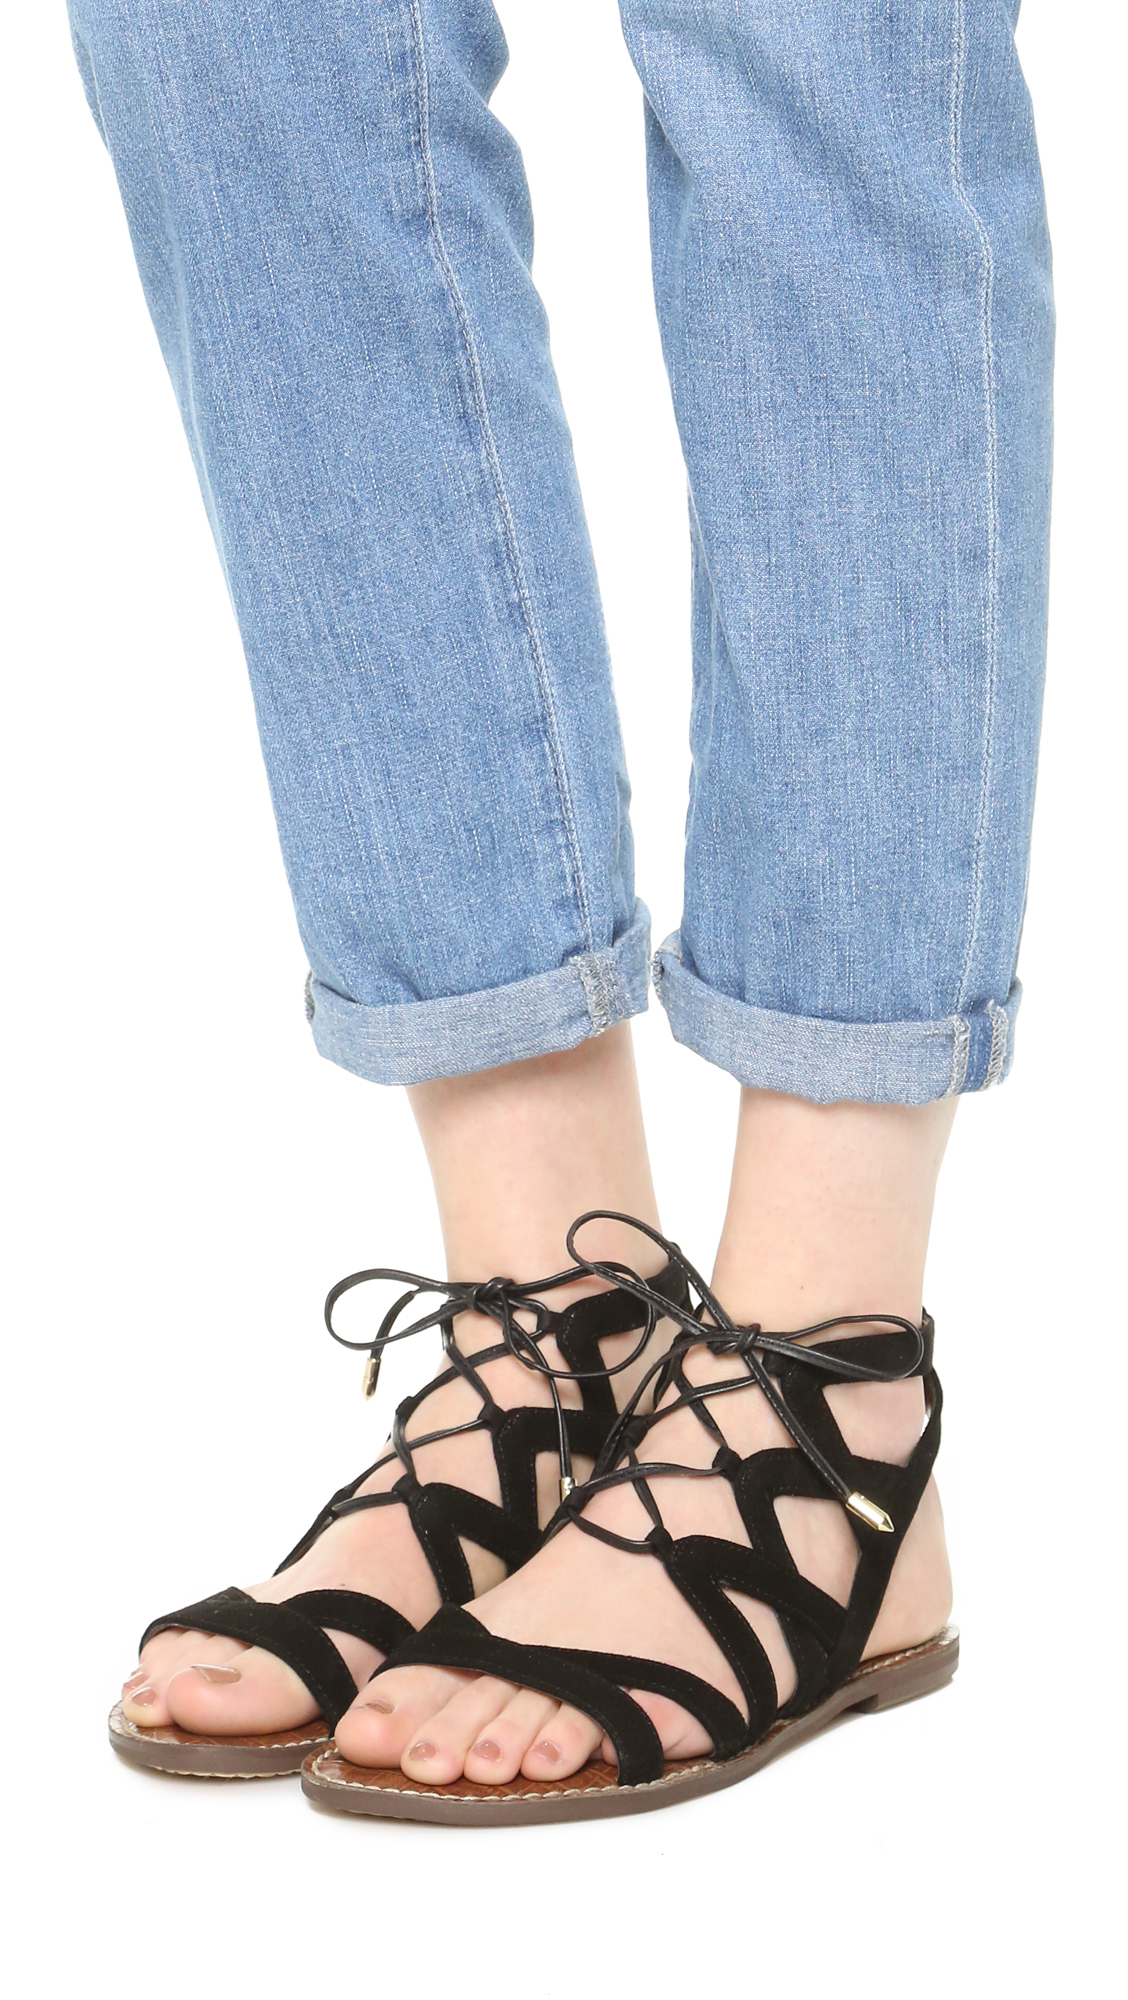 07c0cdeb62d3 Sam Edelman Gemma Gladiator Sandals